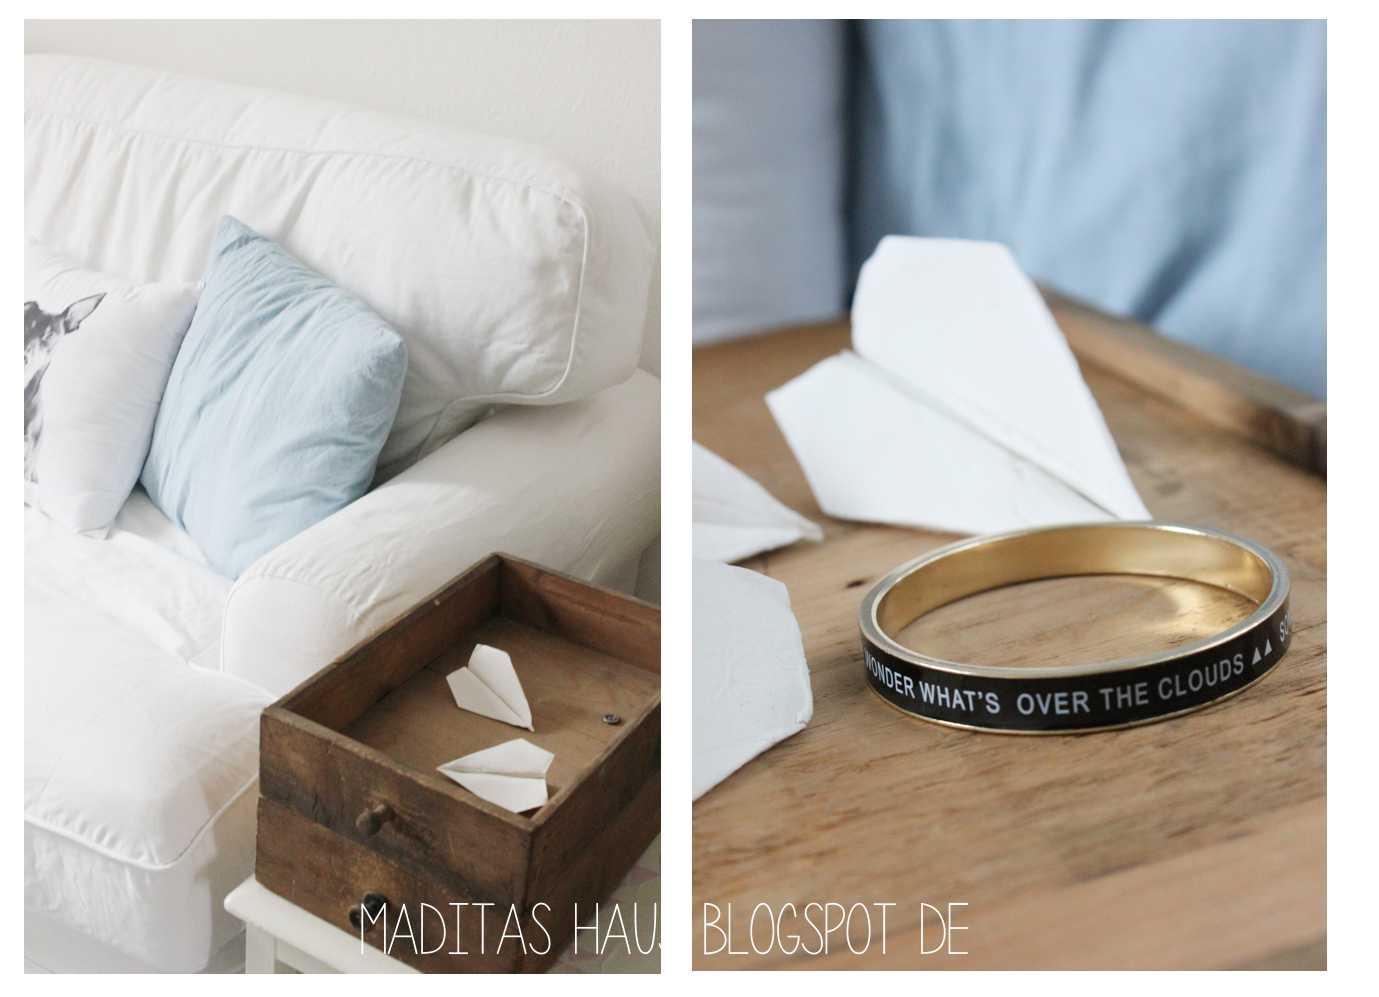 diy paper plane aus modelliermasse maditas haus lifestyle und interior blog. Black Bedroom Furniture Sets. Home Design Ideas